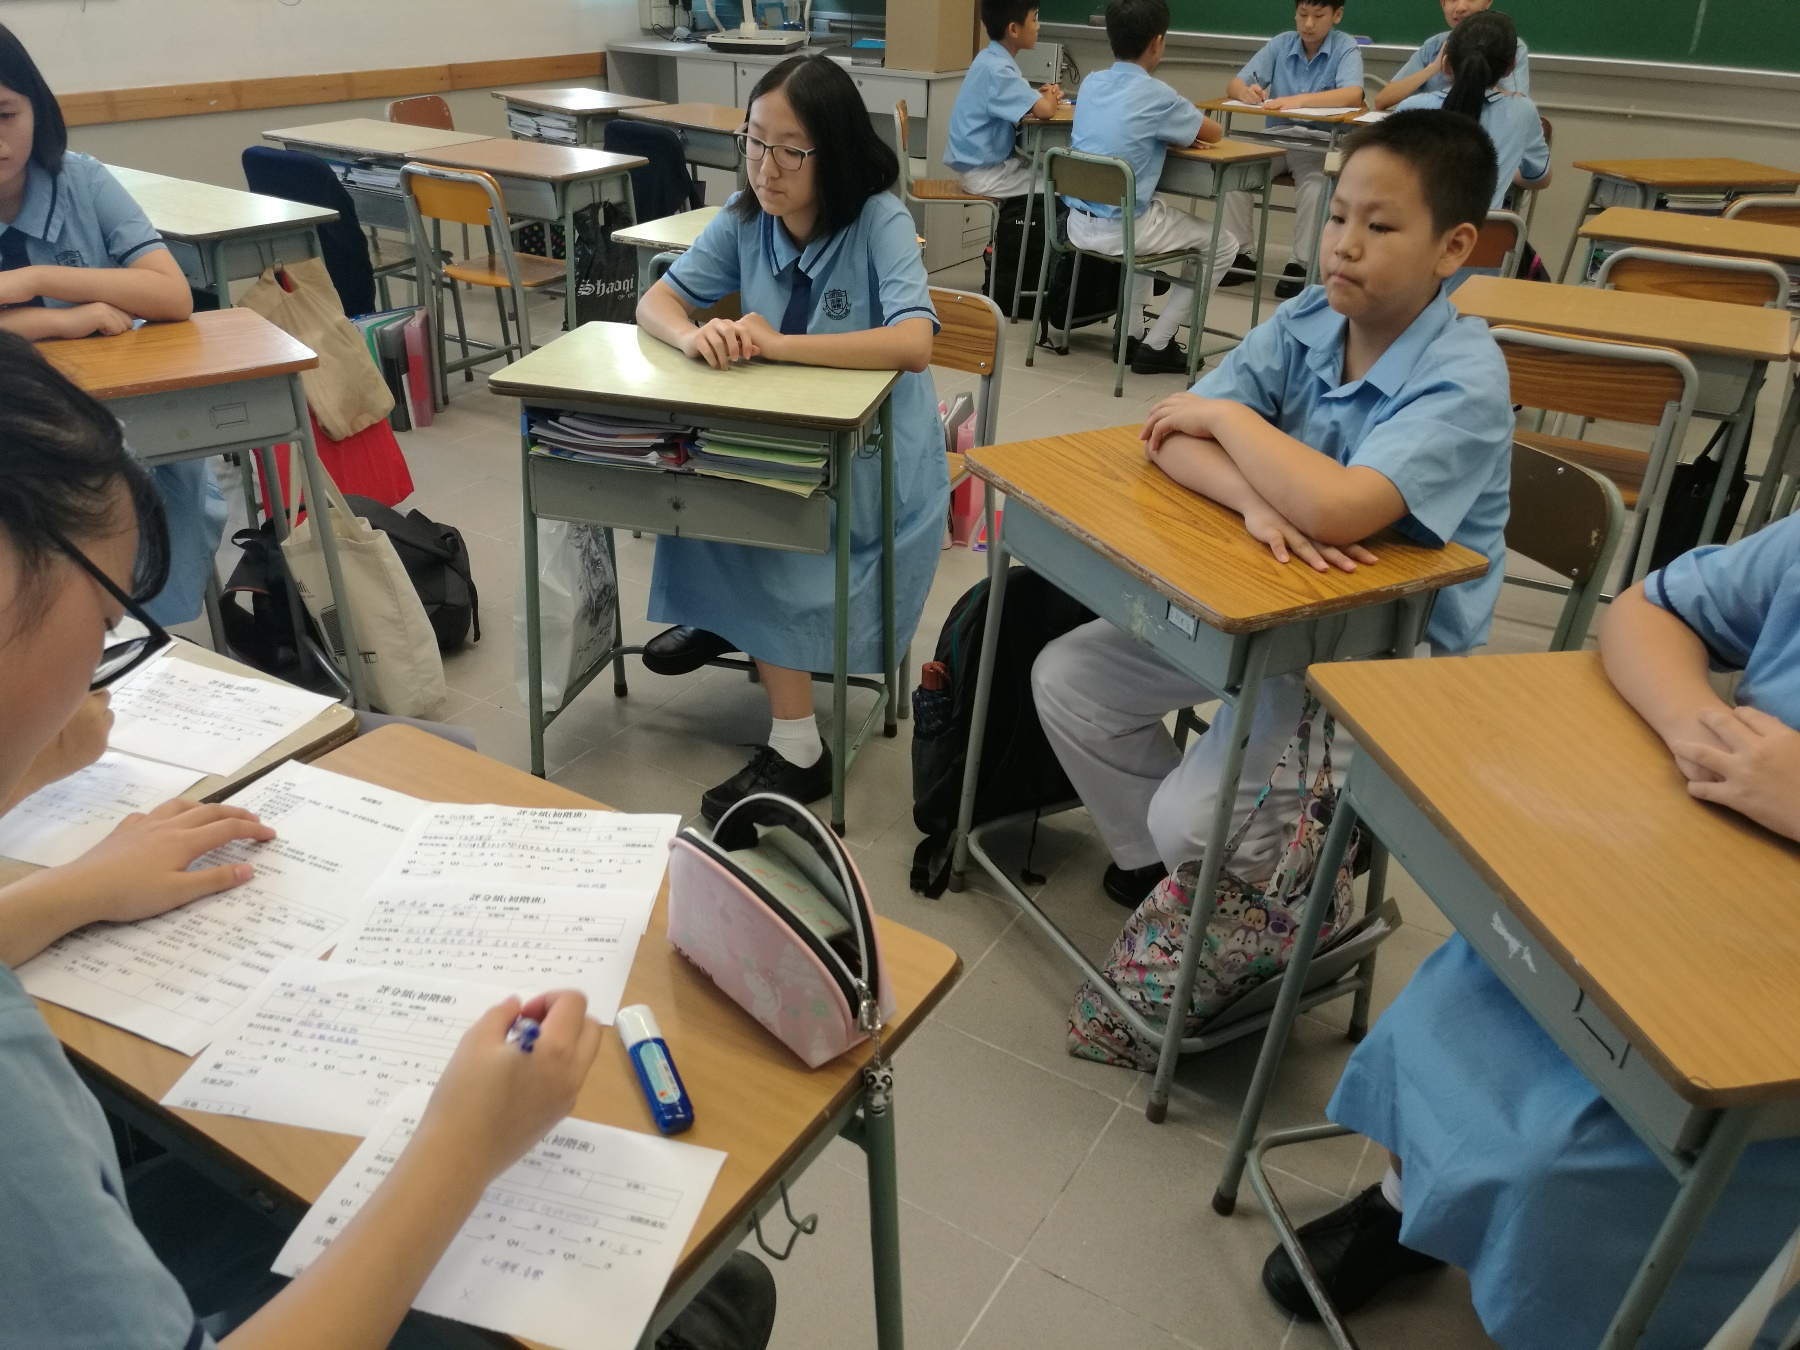 http://www.npc.edu.hk/sites/default/files/img_20170920_163250.jpg